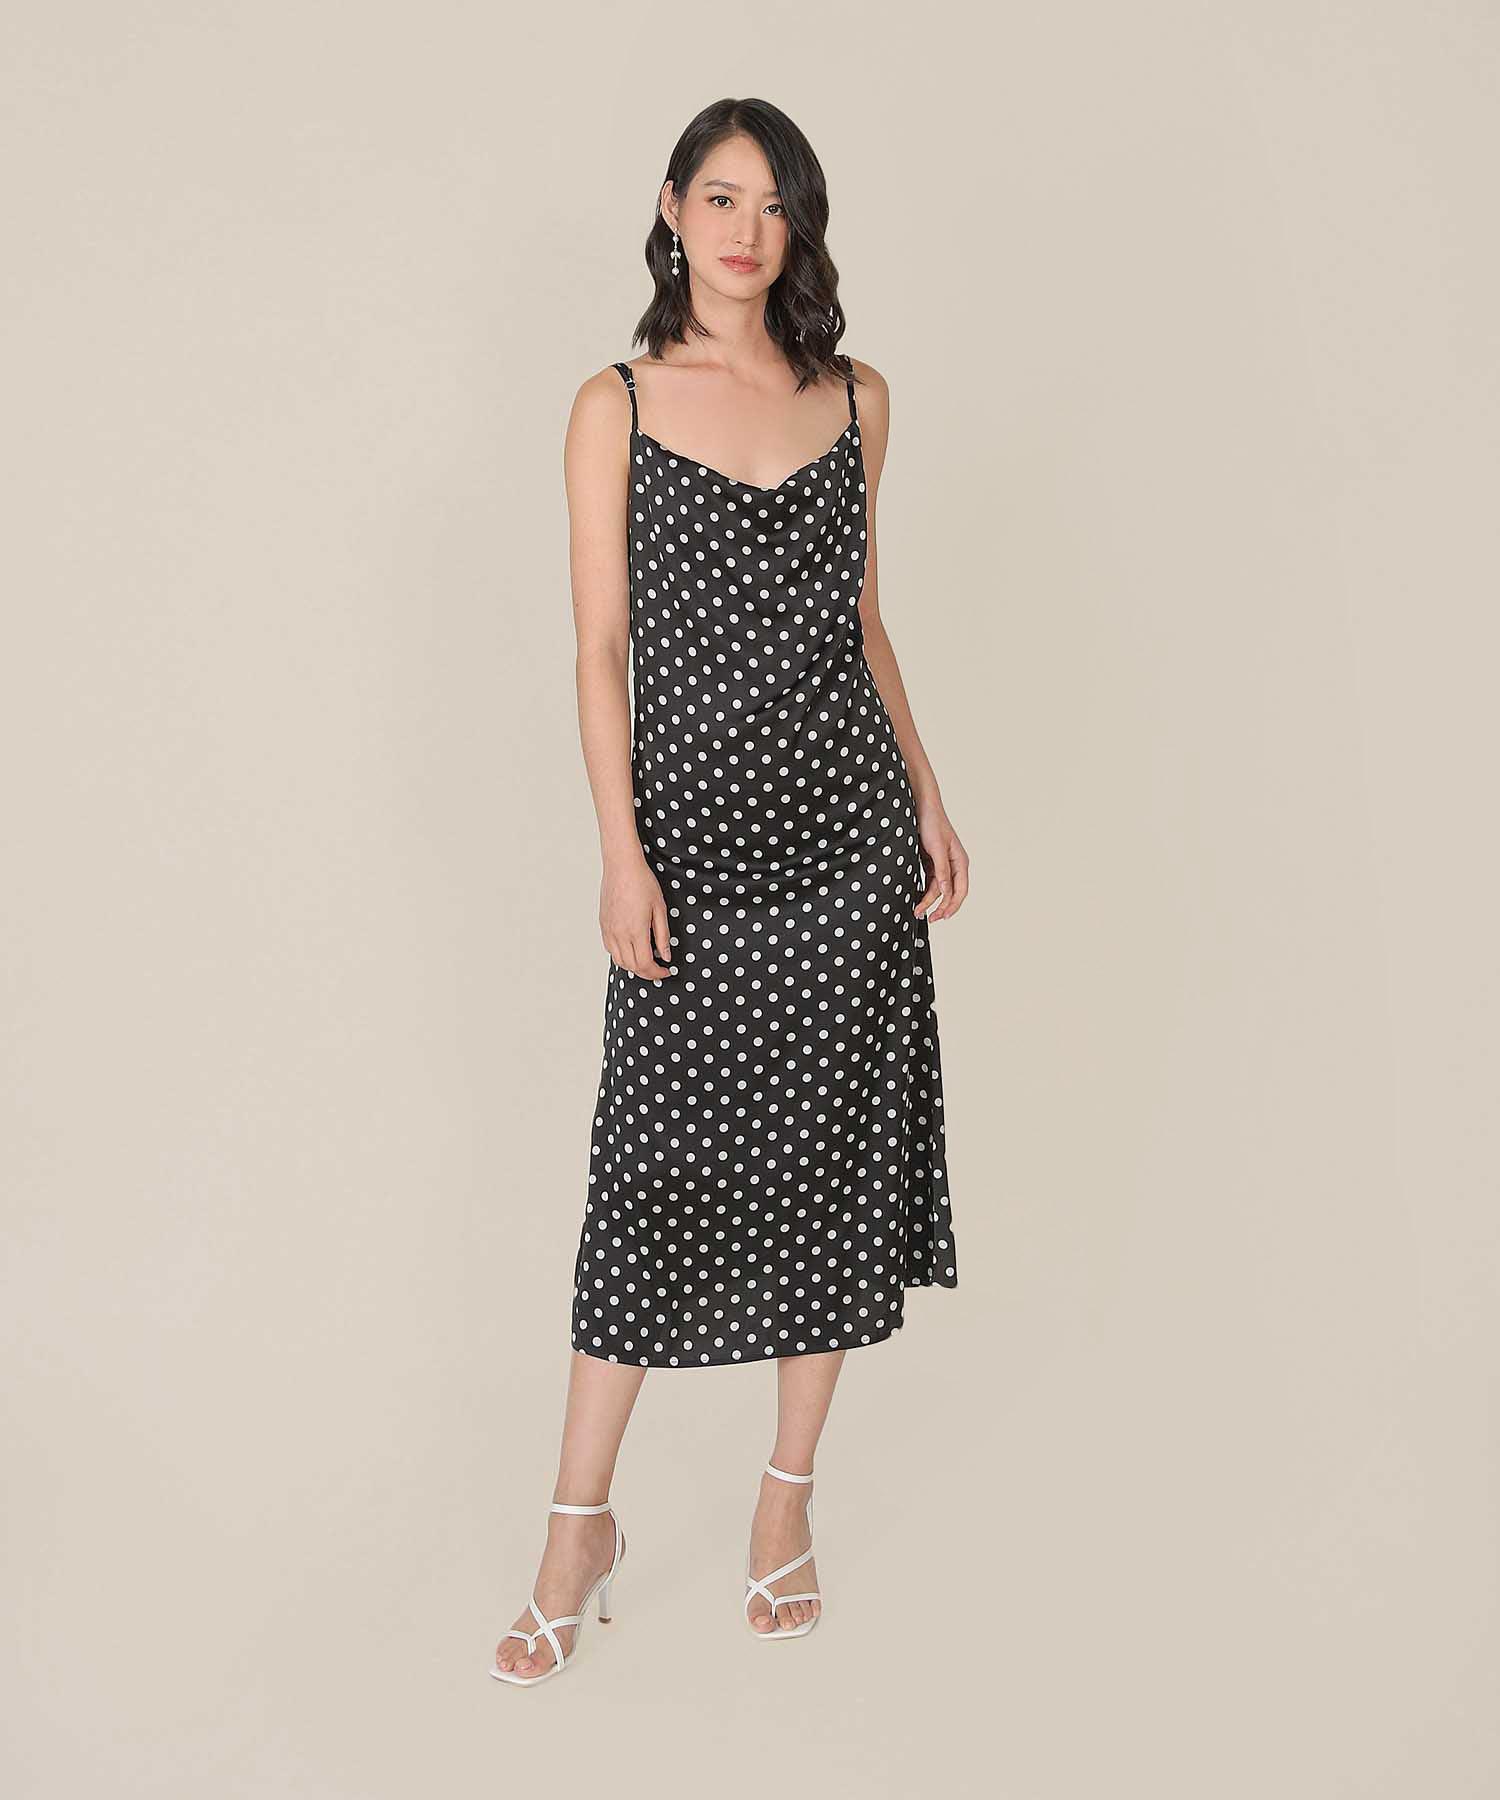 berenice-polka-cowl-neck-midaxi-dress-black-1